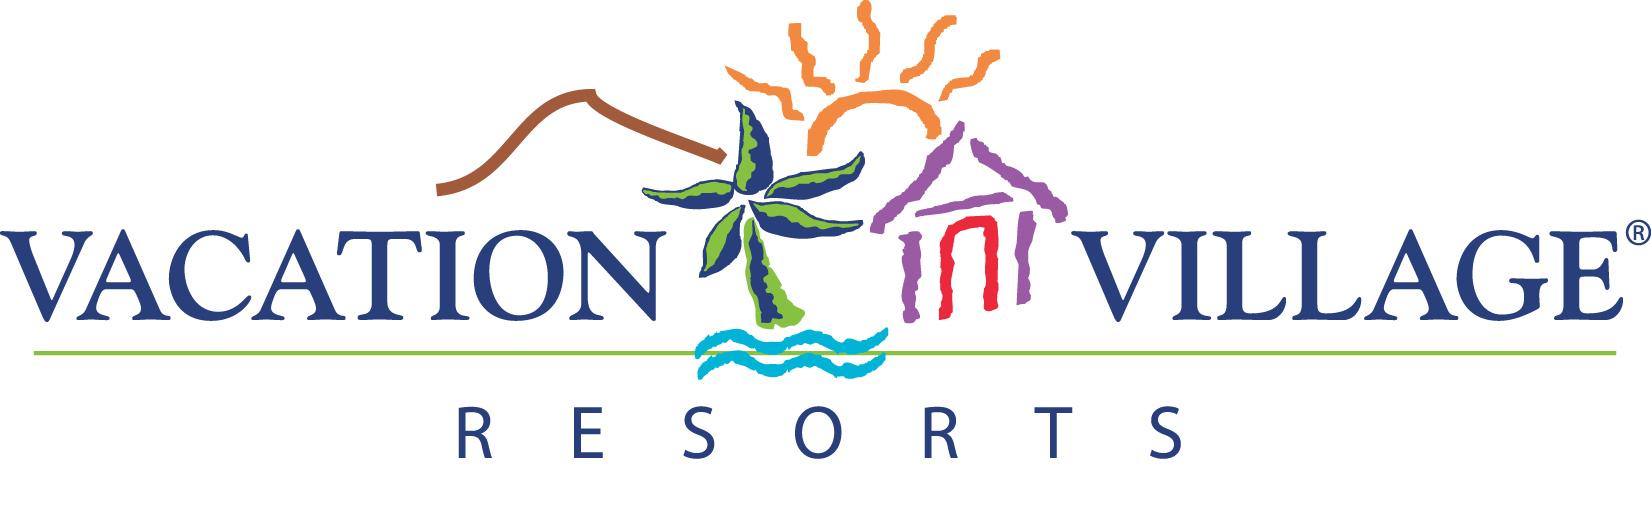 Vacation Village Resorts - Logo